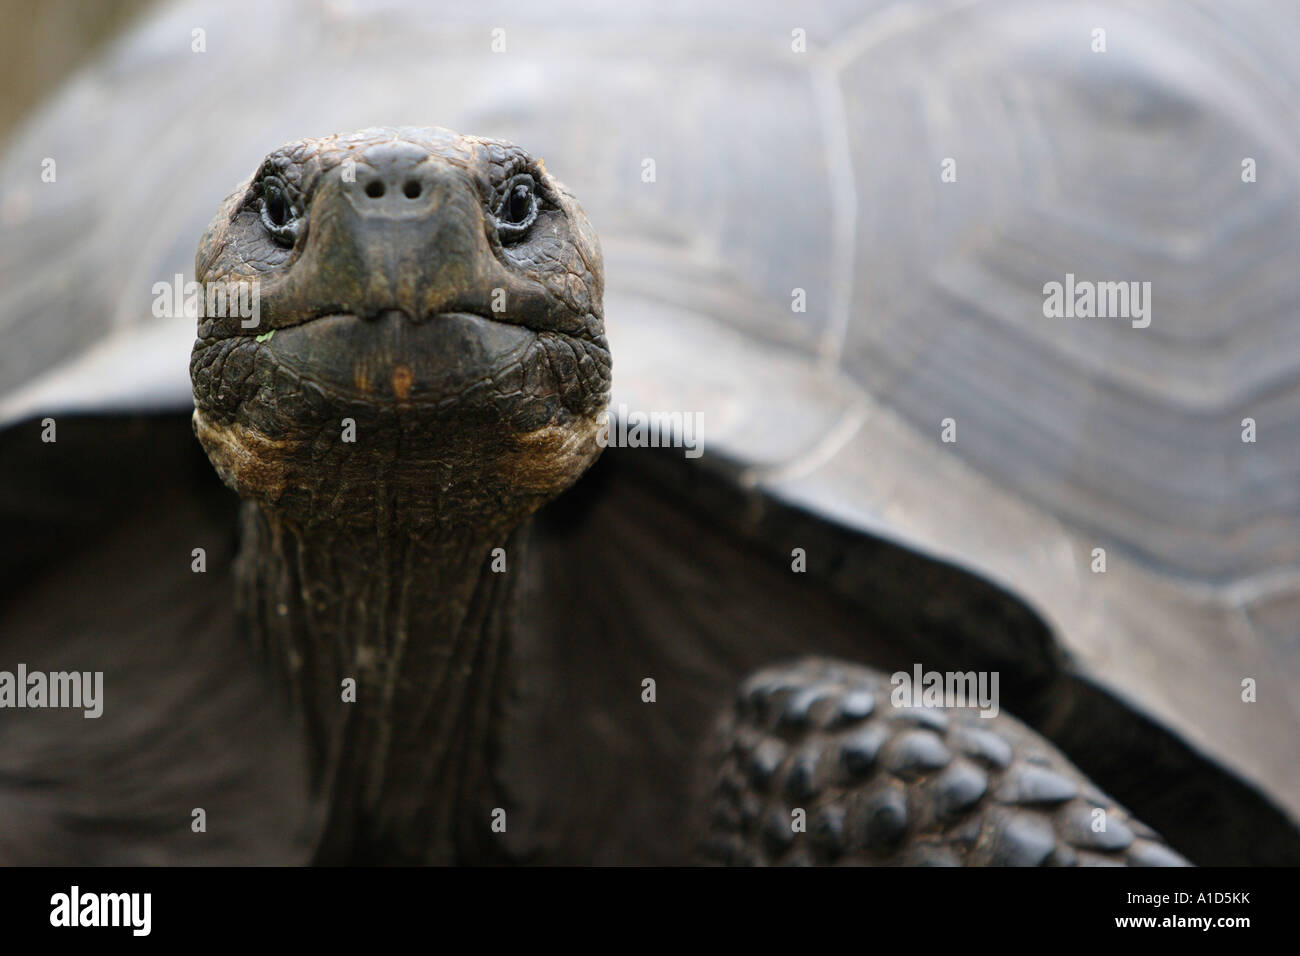 nu72577. Galapagos Giant Tortoise, Geochelone elephantopus. Galapagos Islands. Photo Copyright Brandon Cole - Stock Image